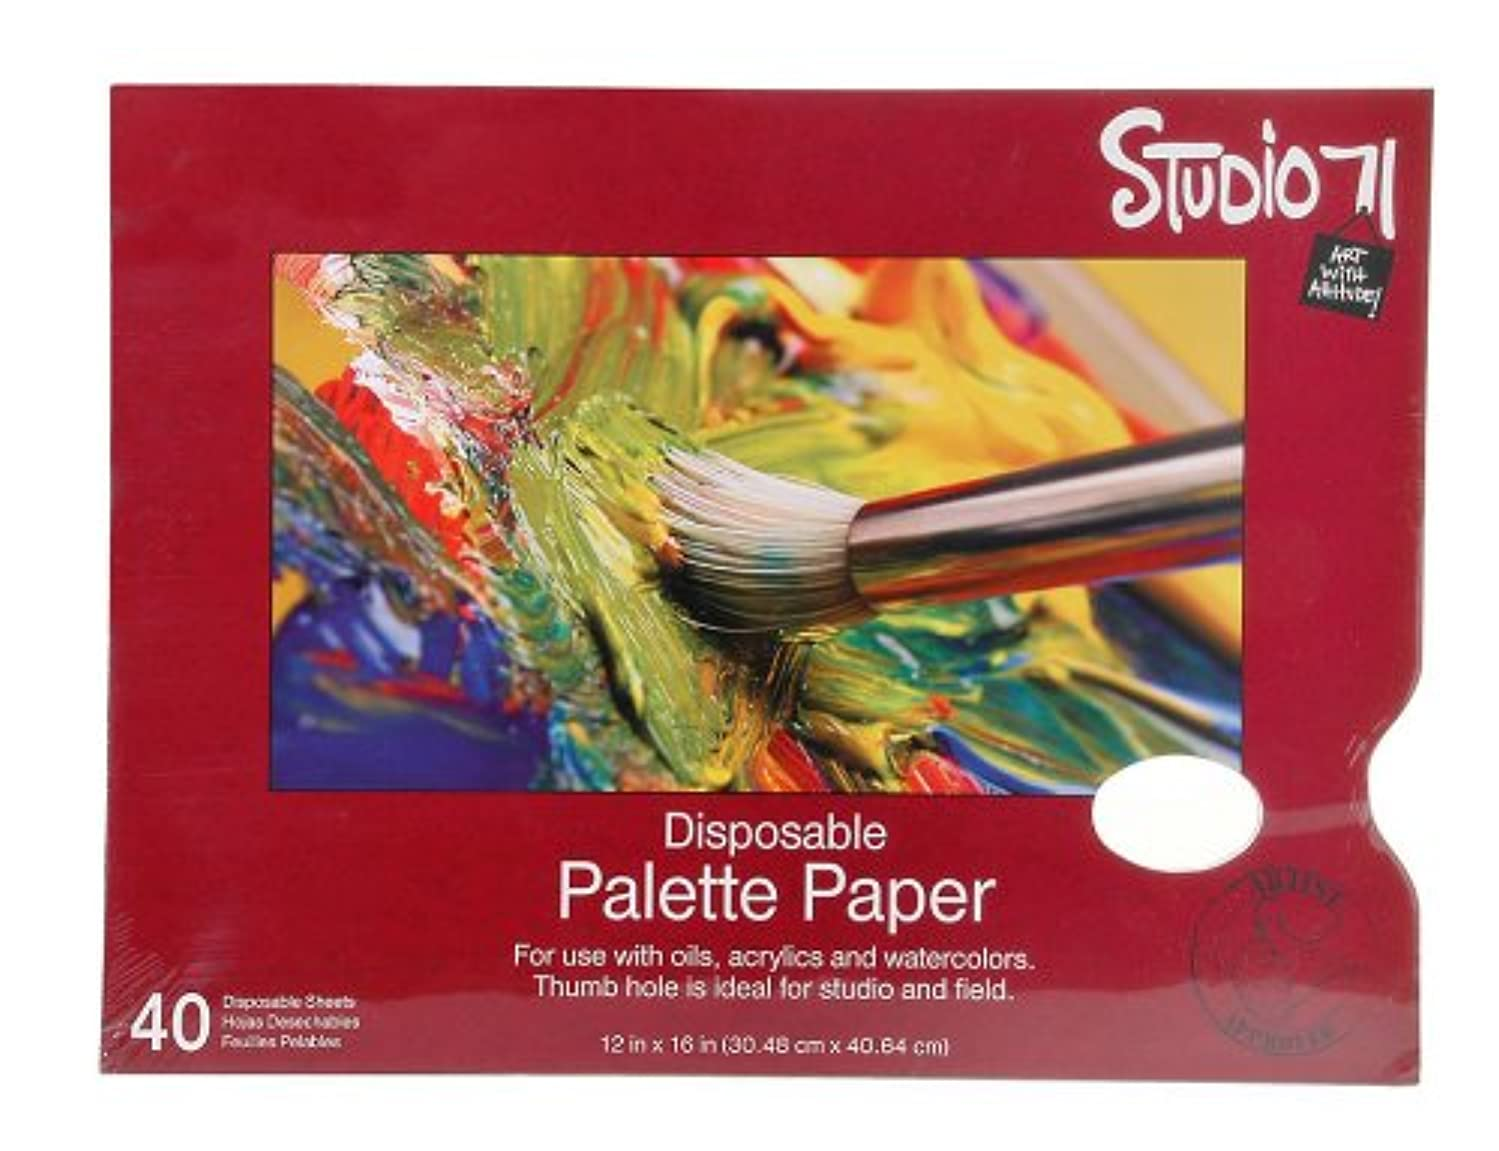 Darice Studio 71 12-Inch-by-16-Inch, 40-Sheet Palette